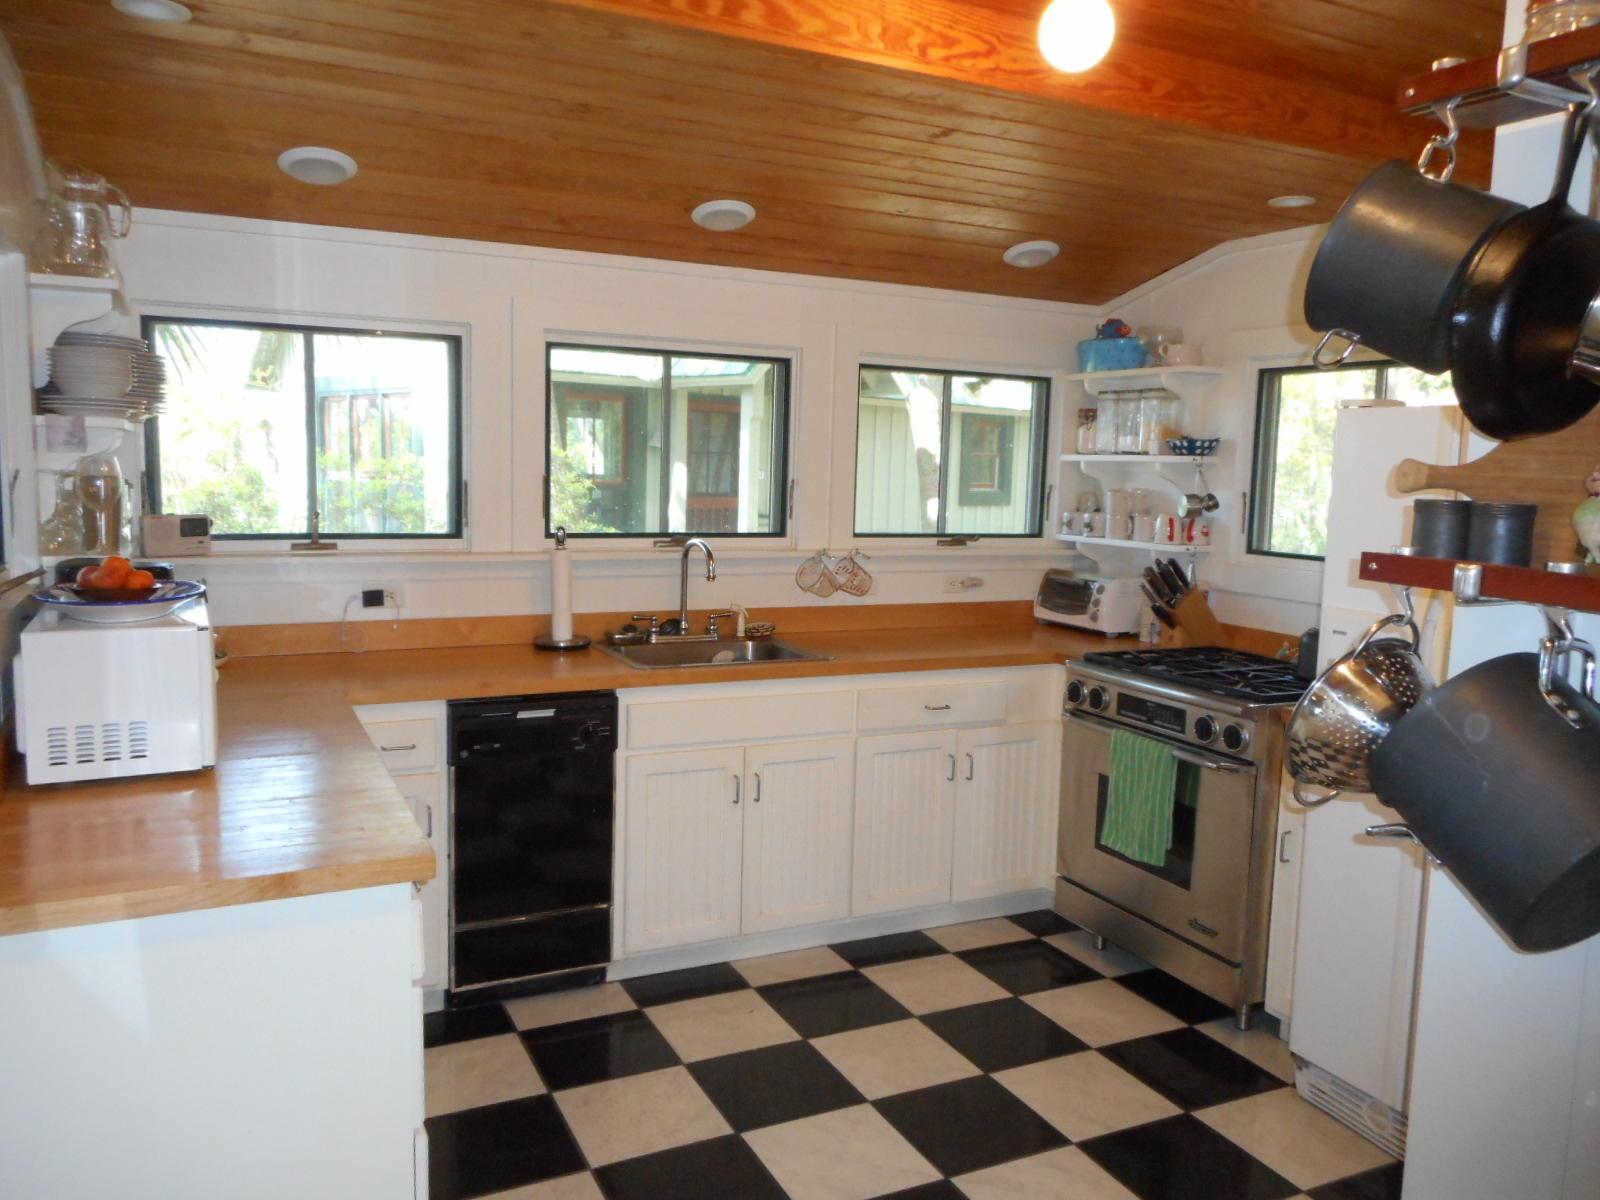 Bailey Island Club Homes For Sale - 2145 Bailey Island, Edisto Island, SC - 11